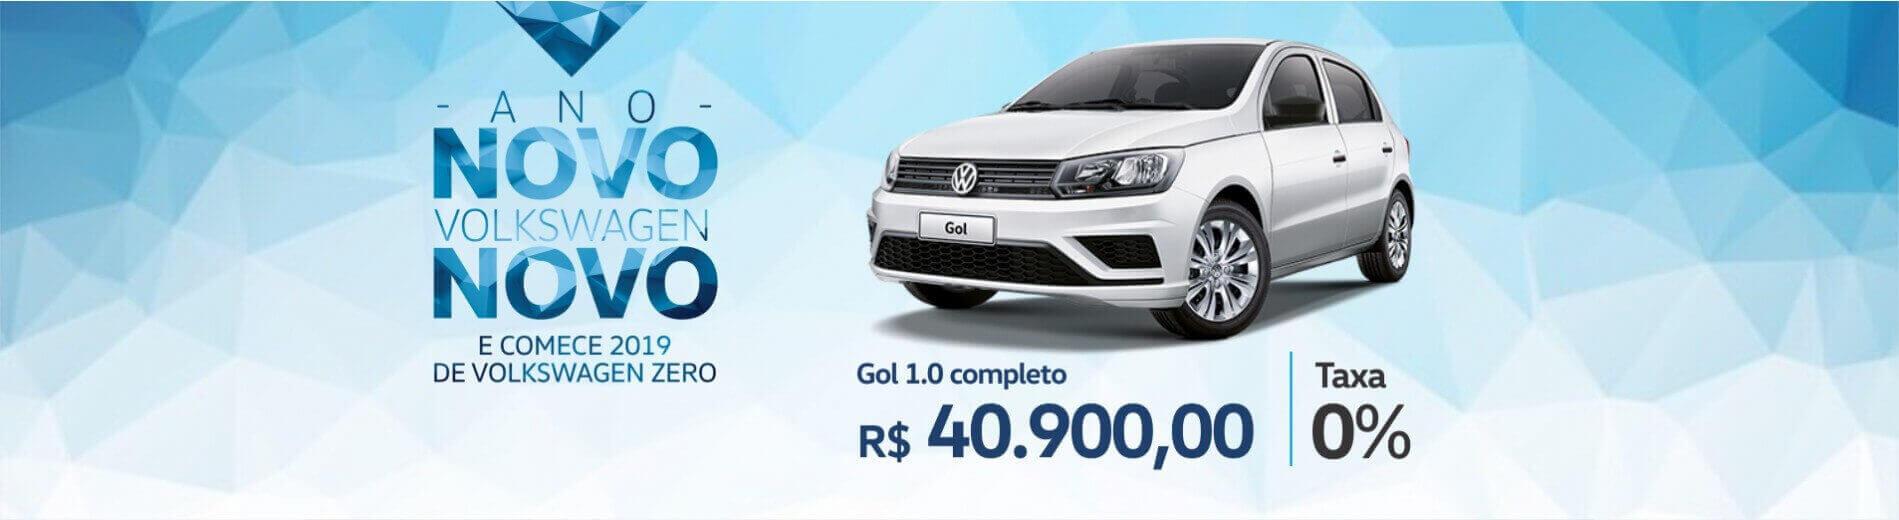 ANO NOVO VW NOVO - Volkswagen Gol 1.0 MSI Completo